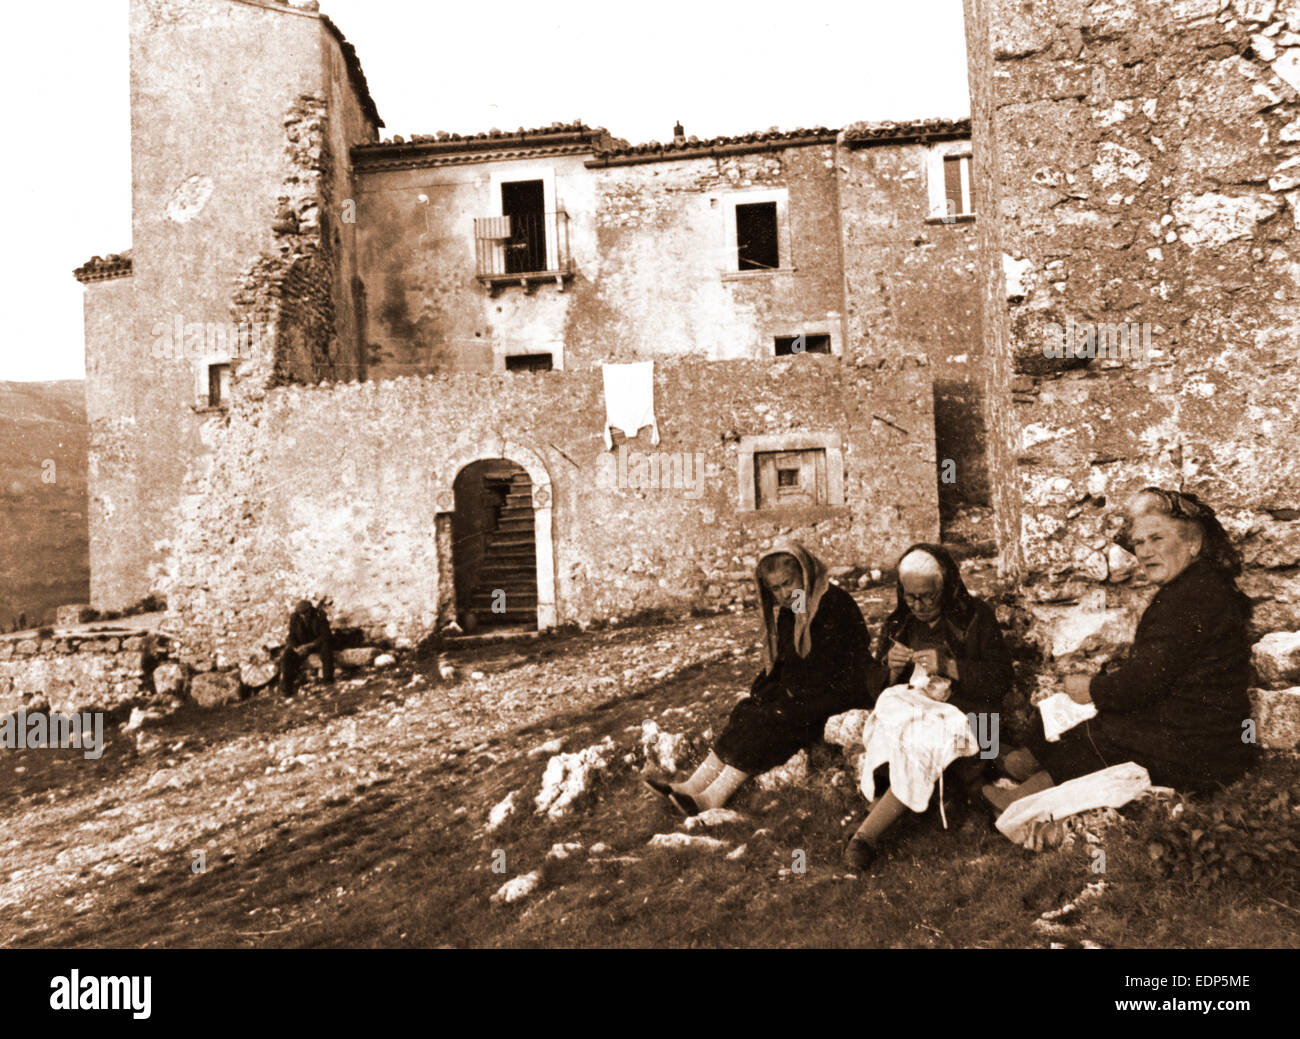 Abruzzo, L'Aquila, Santo Stefano di Sessanio, General views, Ima, Italy, 20th century, photo, photography, Europe - Stock Image